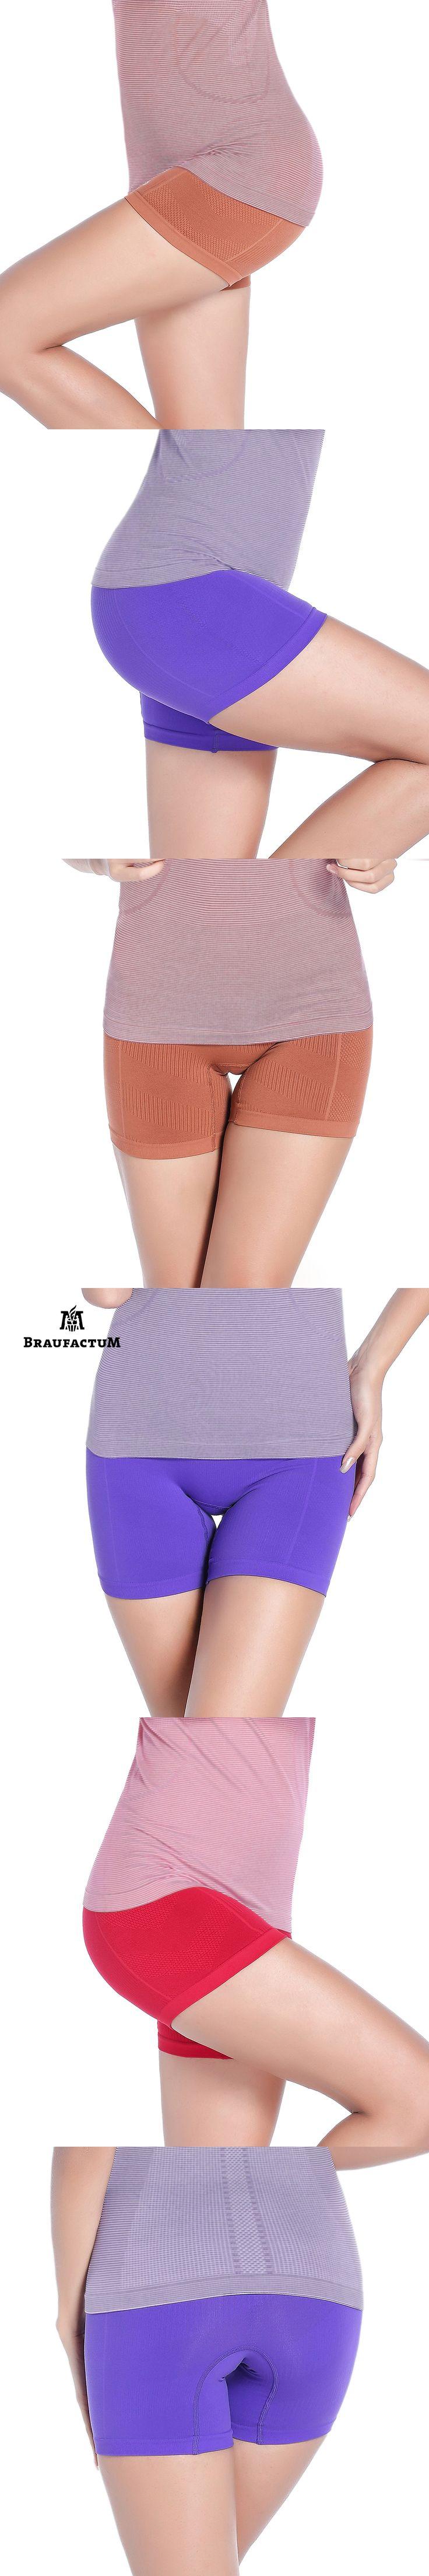 BRAUFACTUM 2017 New Women Sport Trousers Beach Skinny Short Sports Underwear Women Quick Dry Yoga Sport Running Fitness Jogging